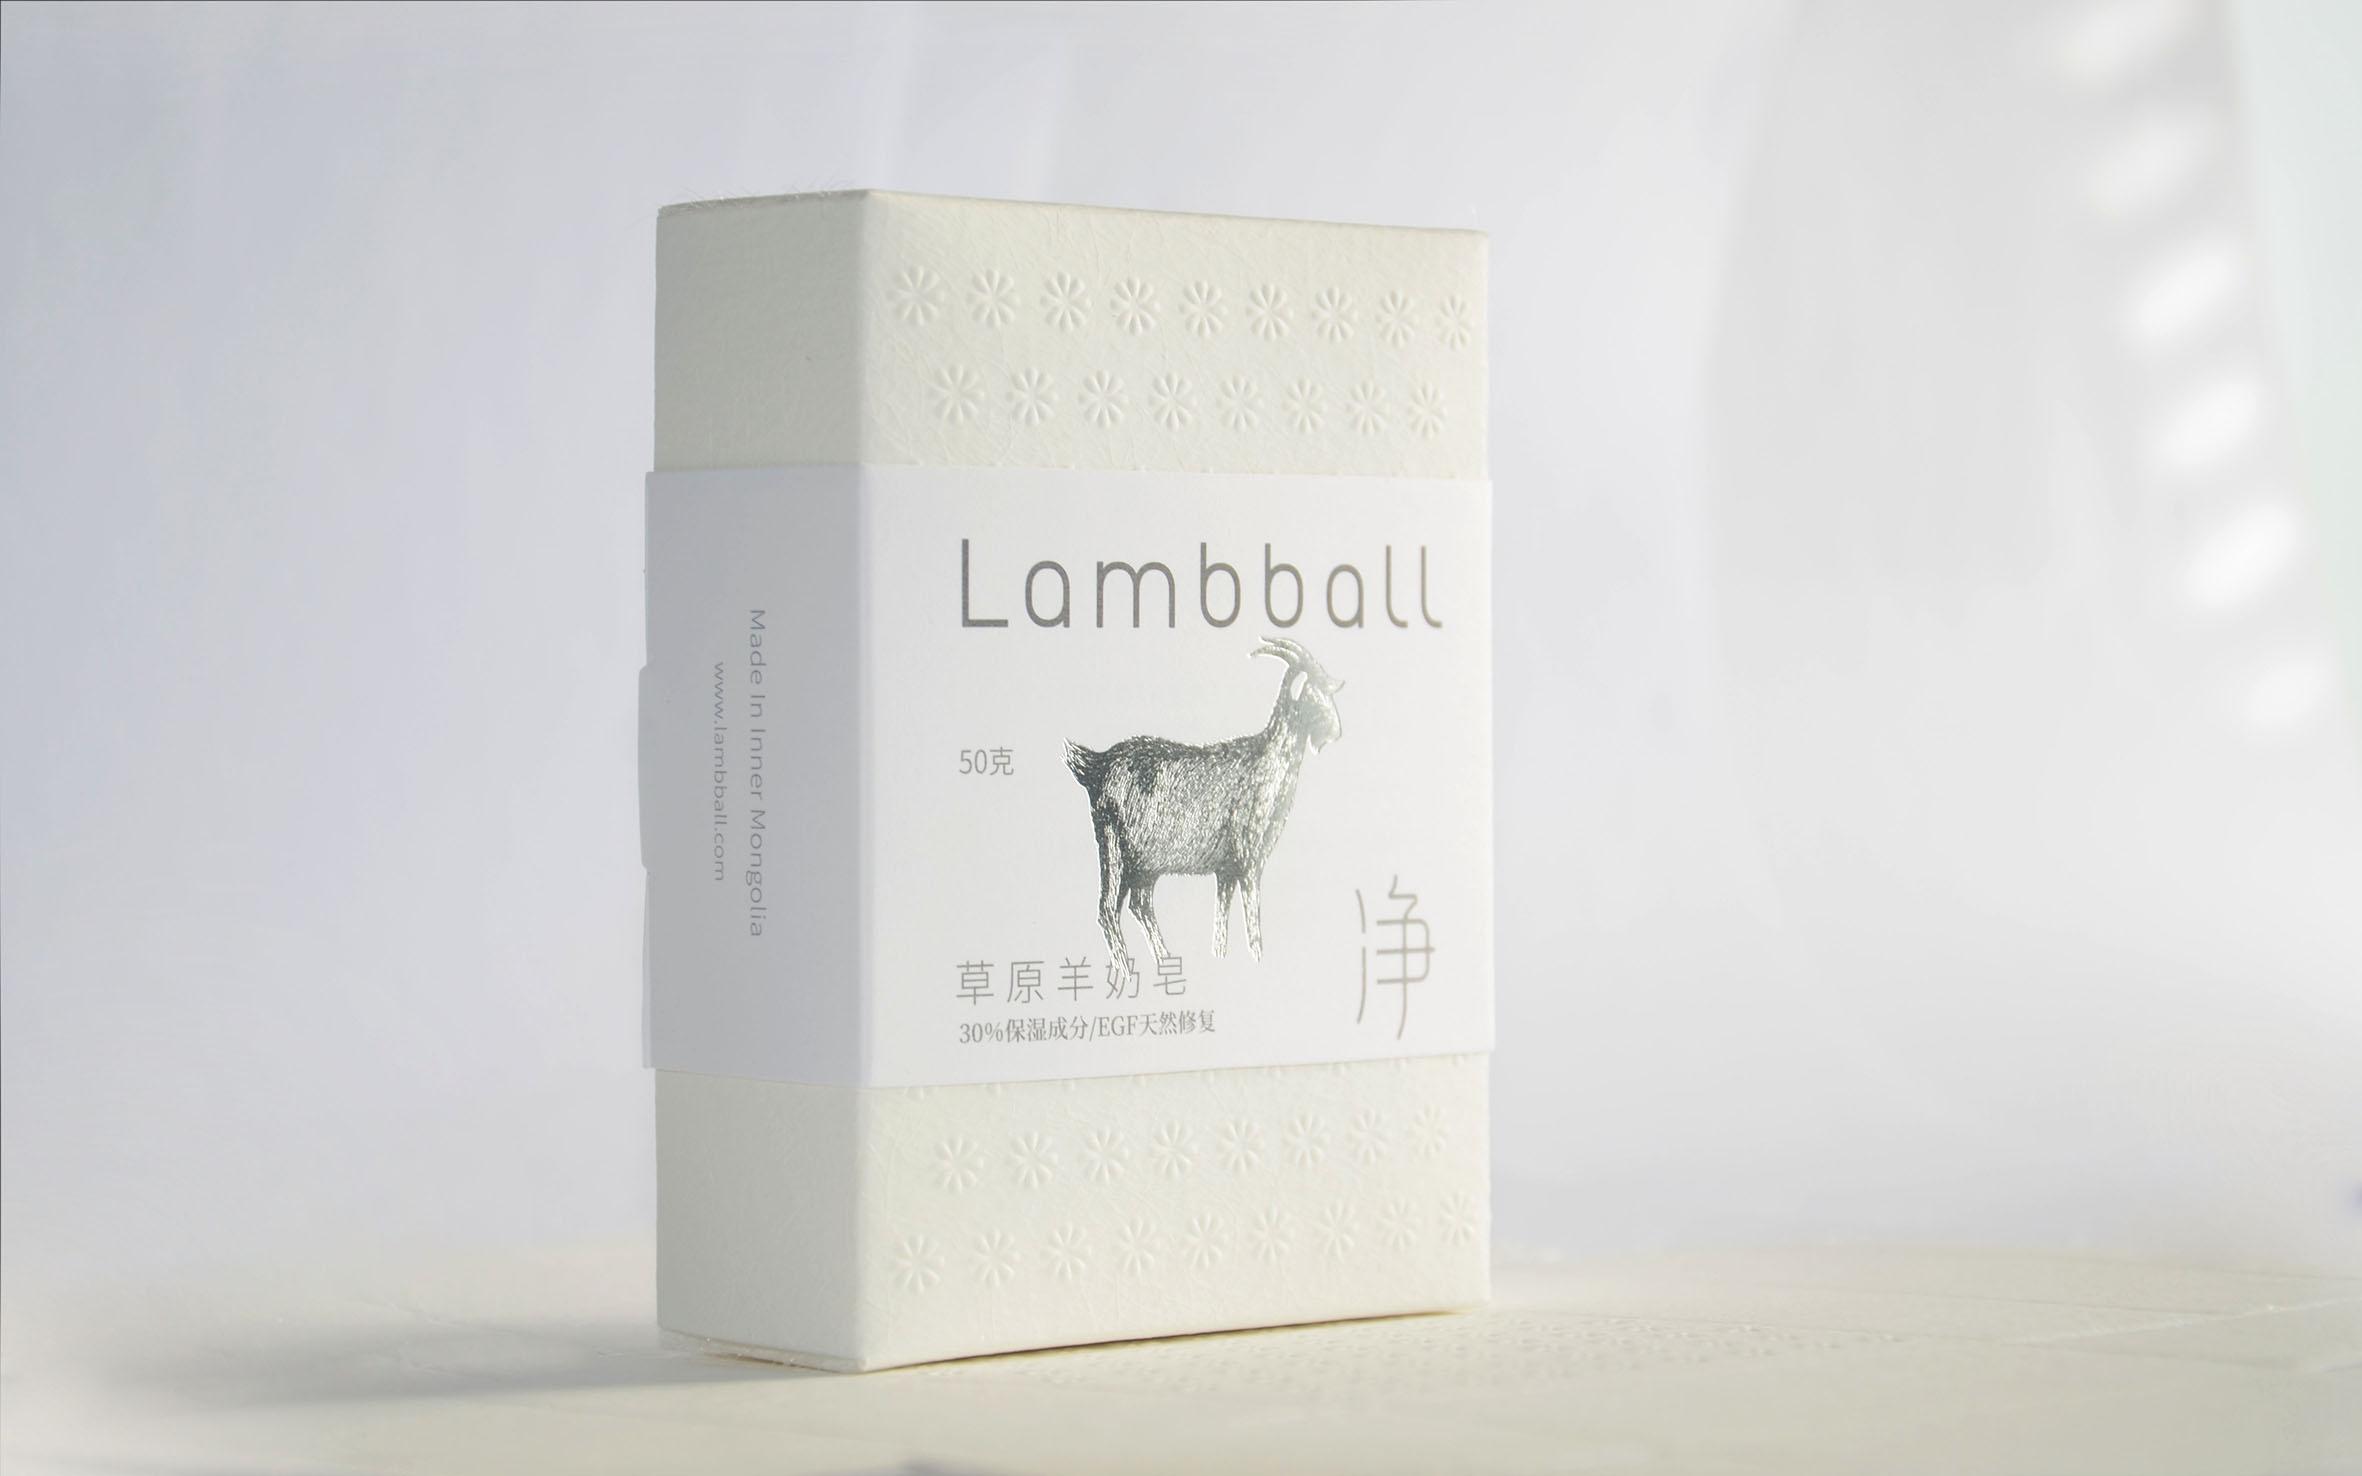 lambball羊奶皂包装设计 第4张